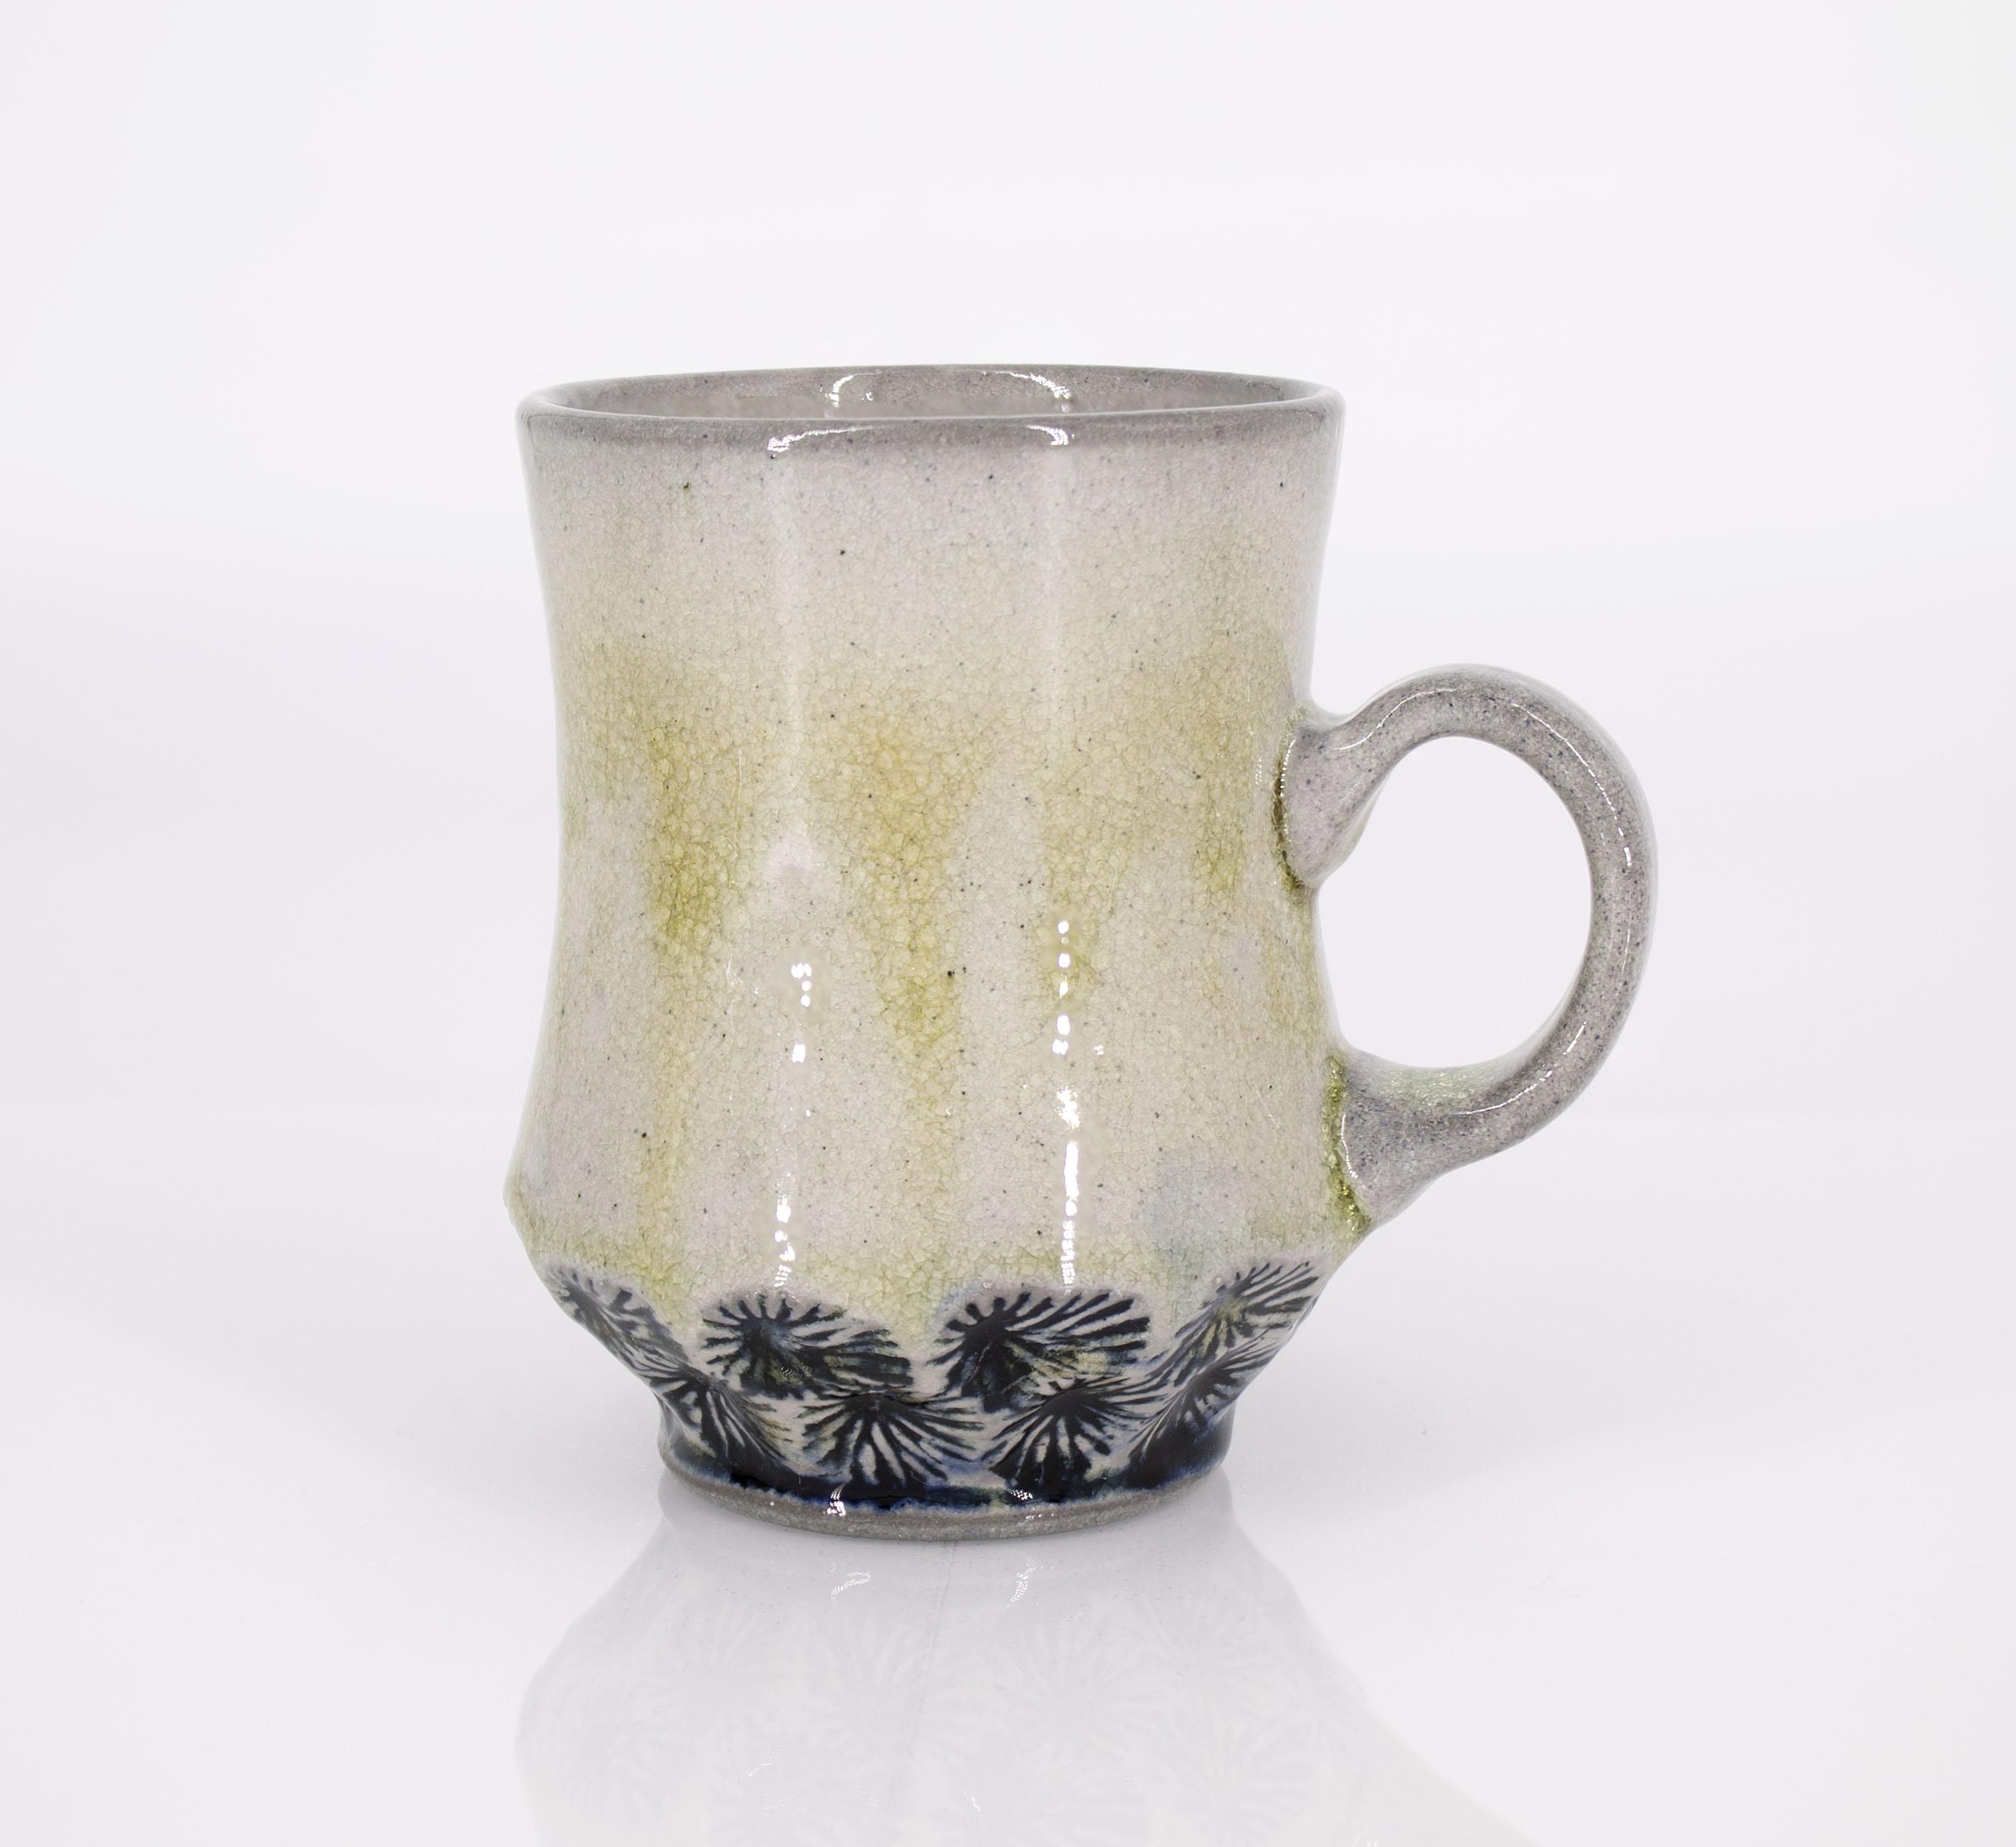 Soda fired diner mug, 2020